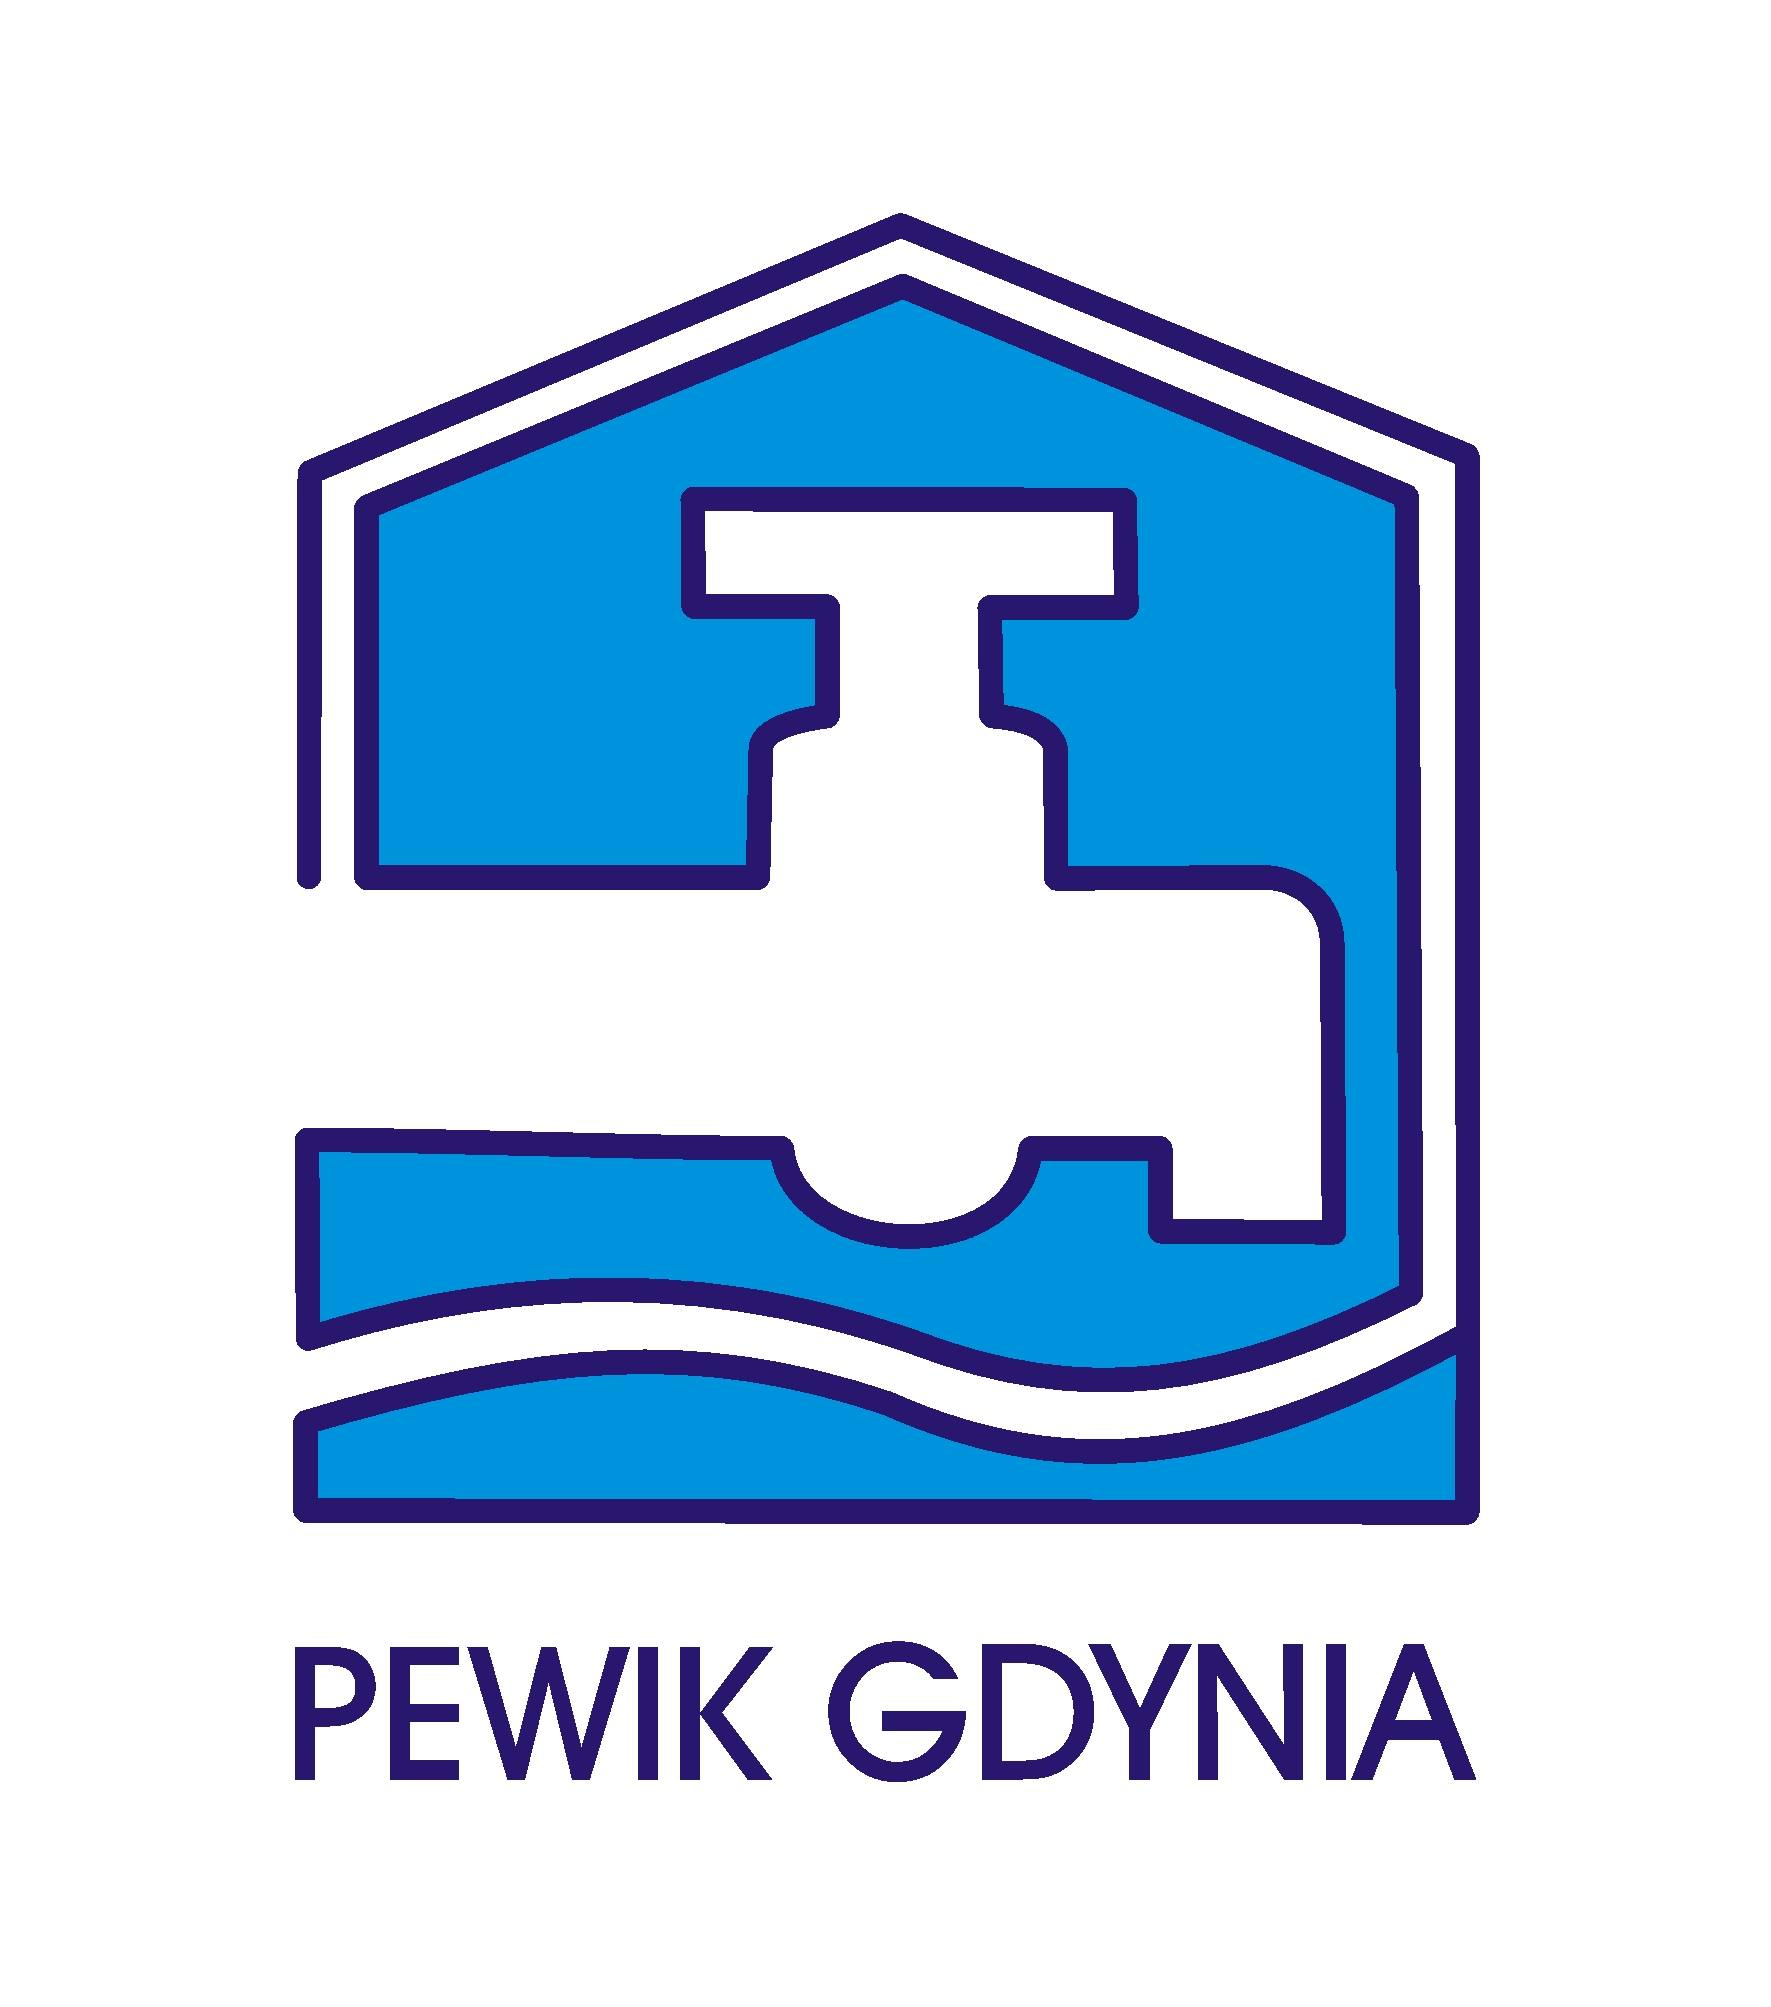 PEWIK